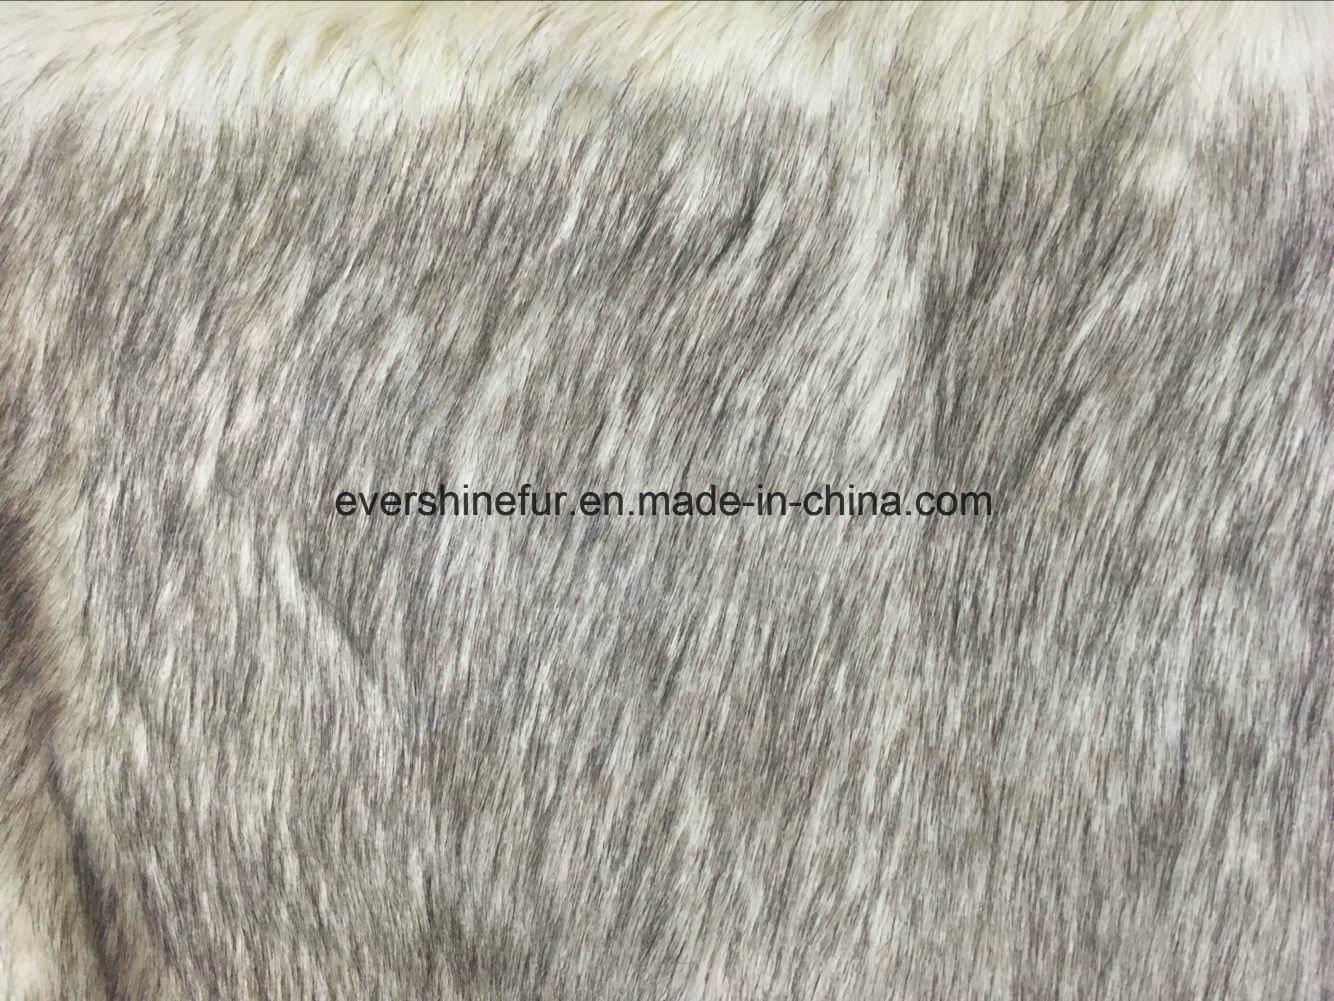 Mac Fur Hot High Pile Artificial Fur Faux Fur Long Pile Fur Fabric for Garment/Toy